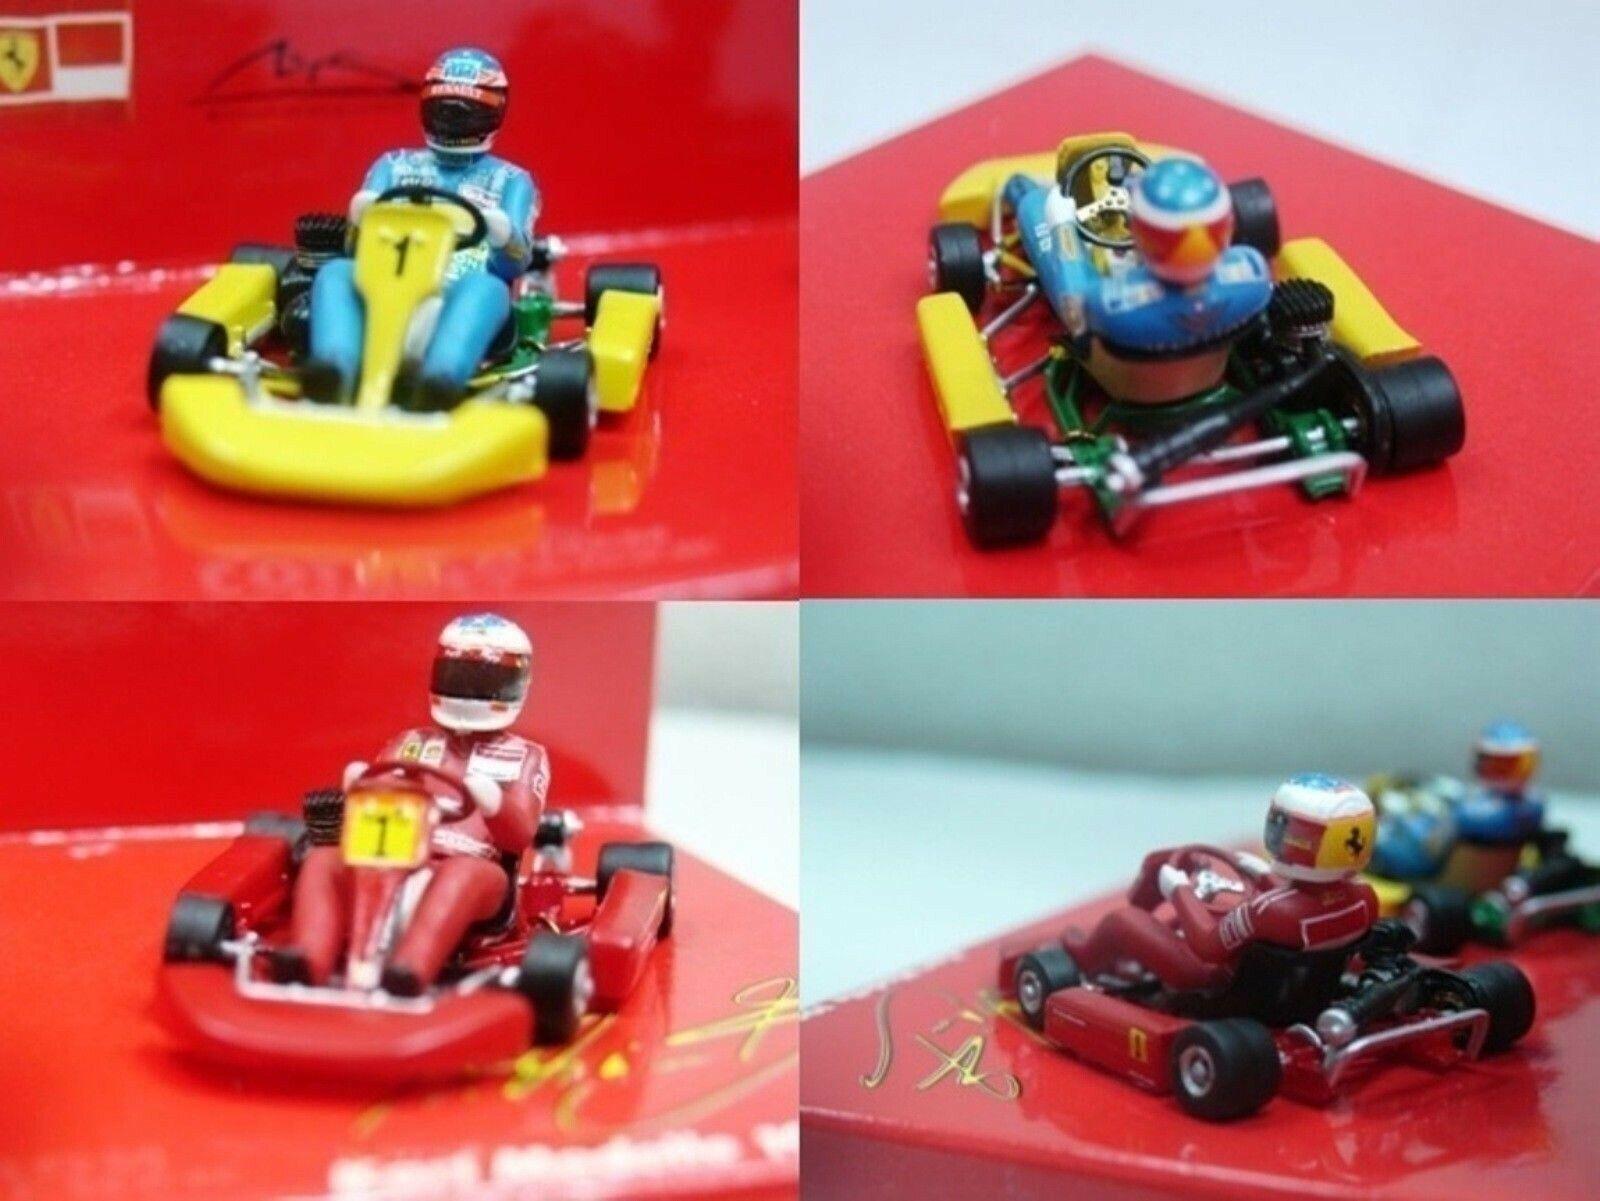 WOW EXTREMELY RARE Kart Schumacher Kart Set 1995 & 1996 MSC  43 Minichamps